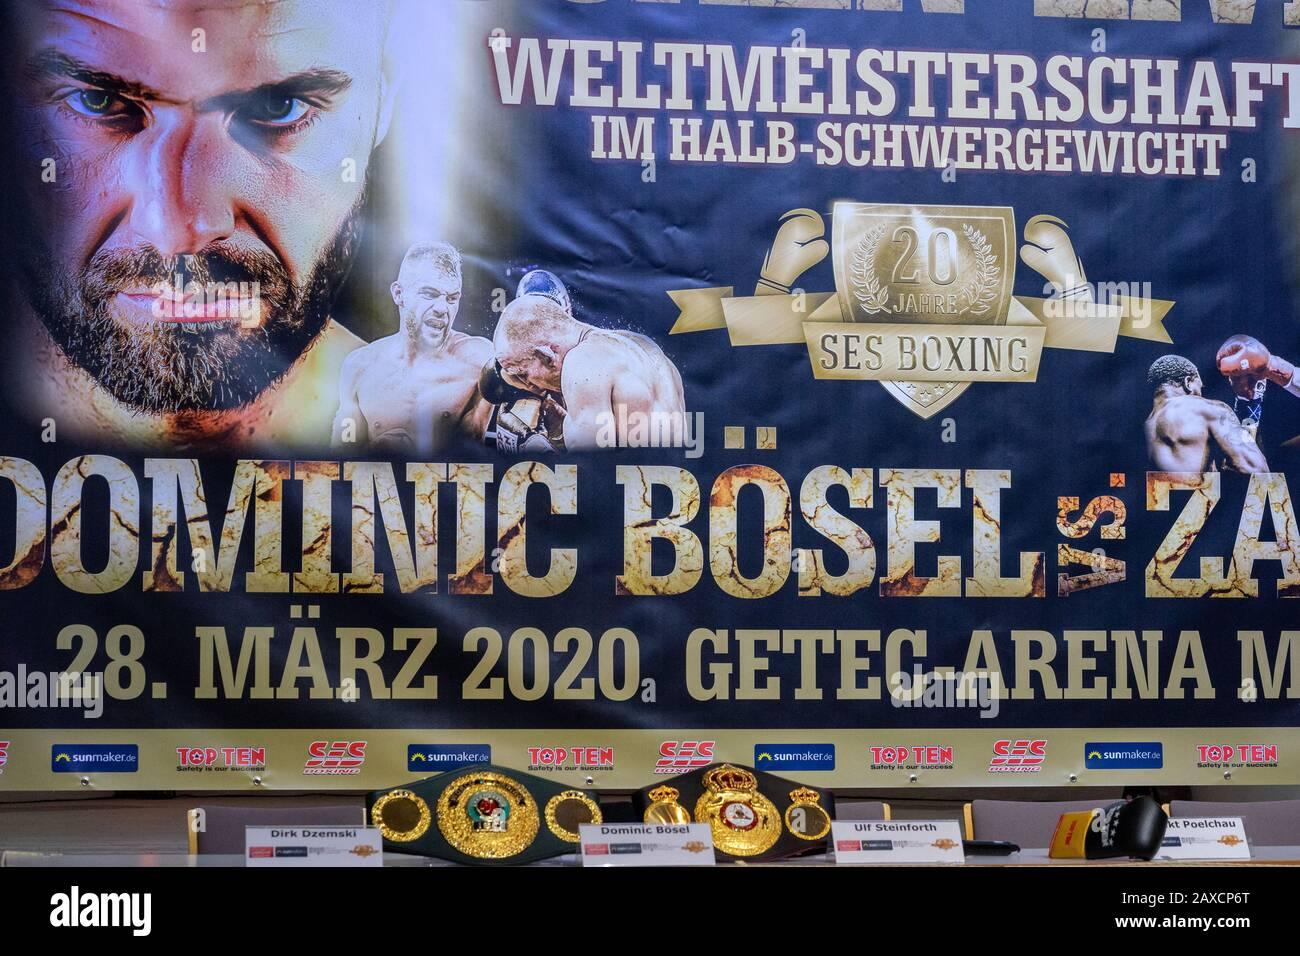 Boxen; Magdeburg; Presse; Pressekonferenz; SES; Stock Photo